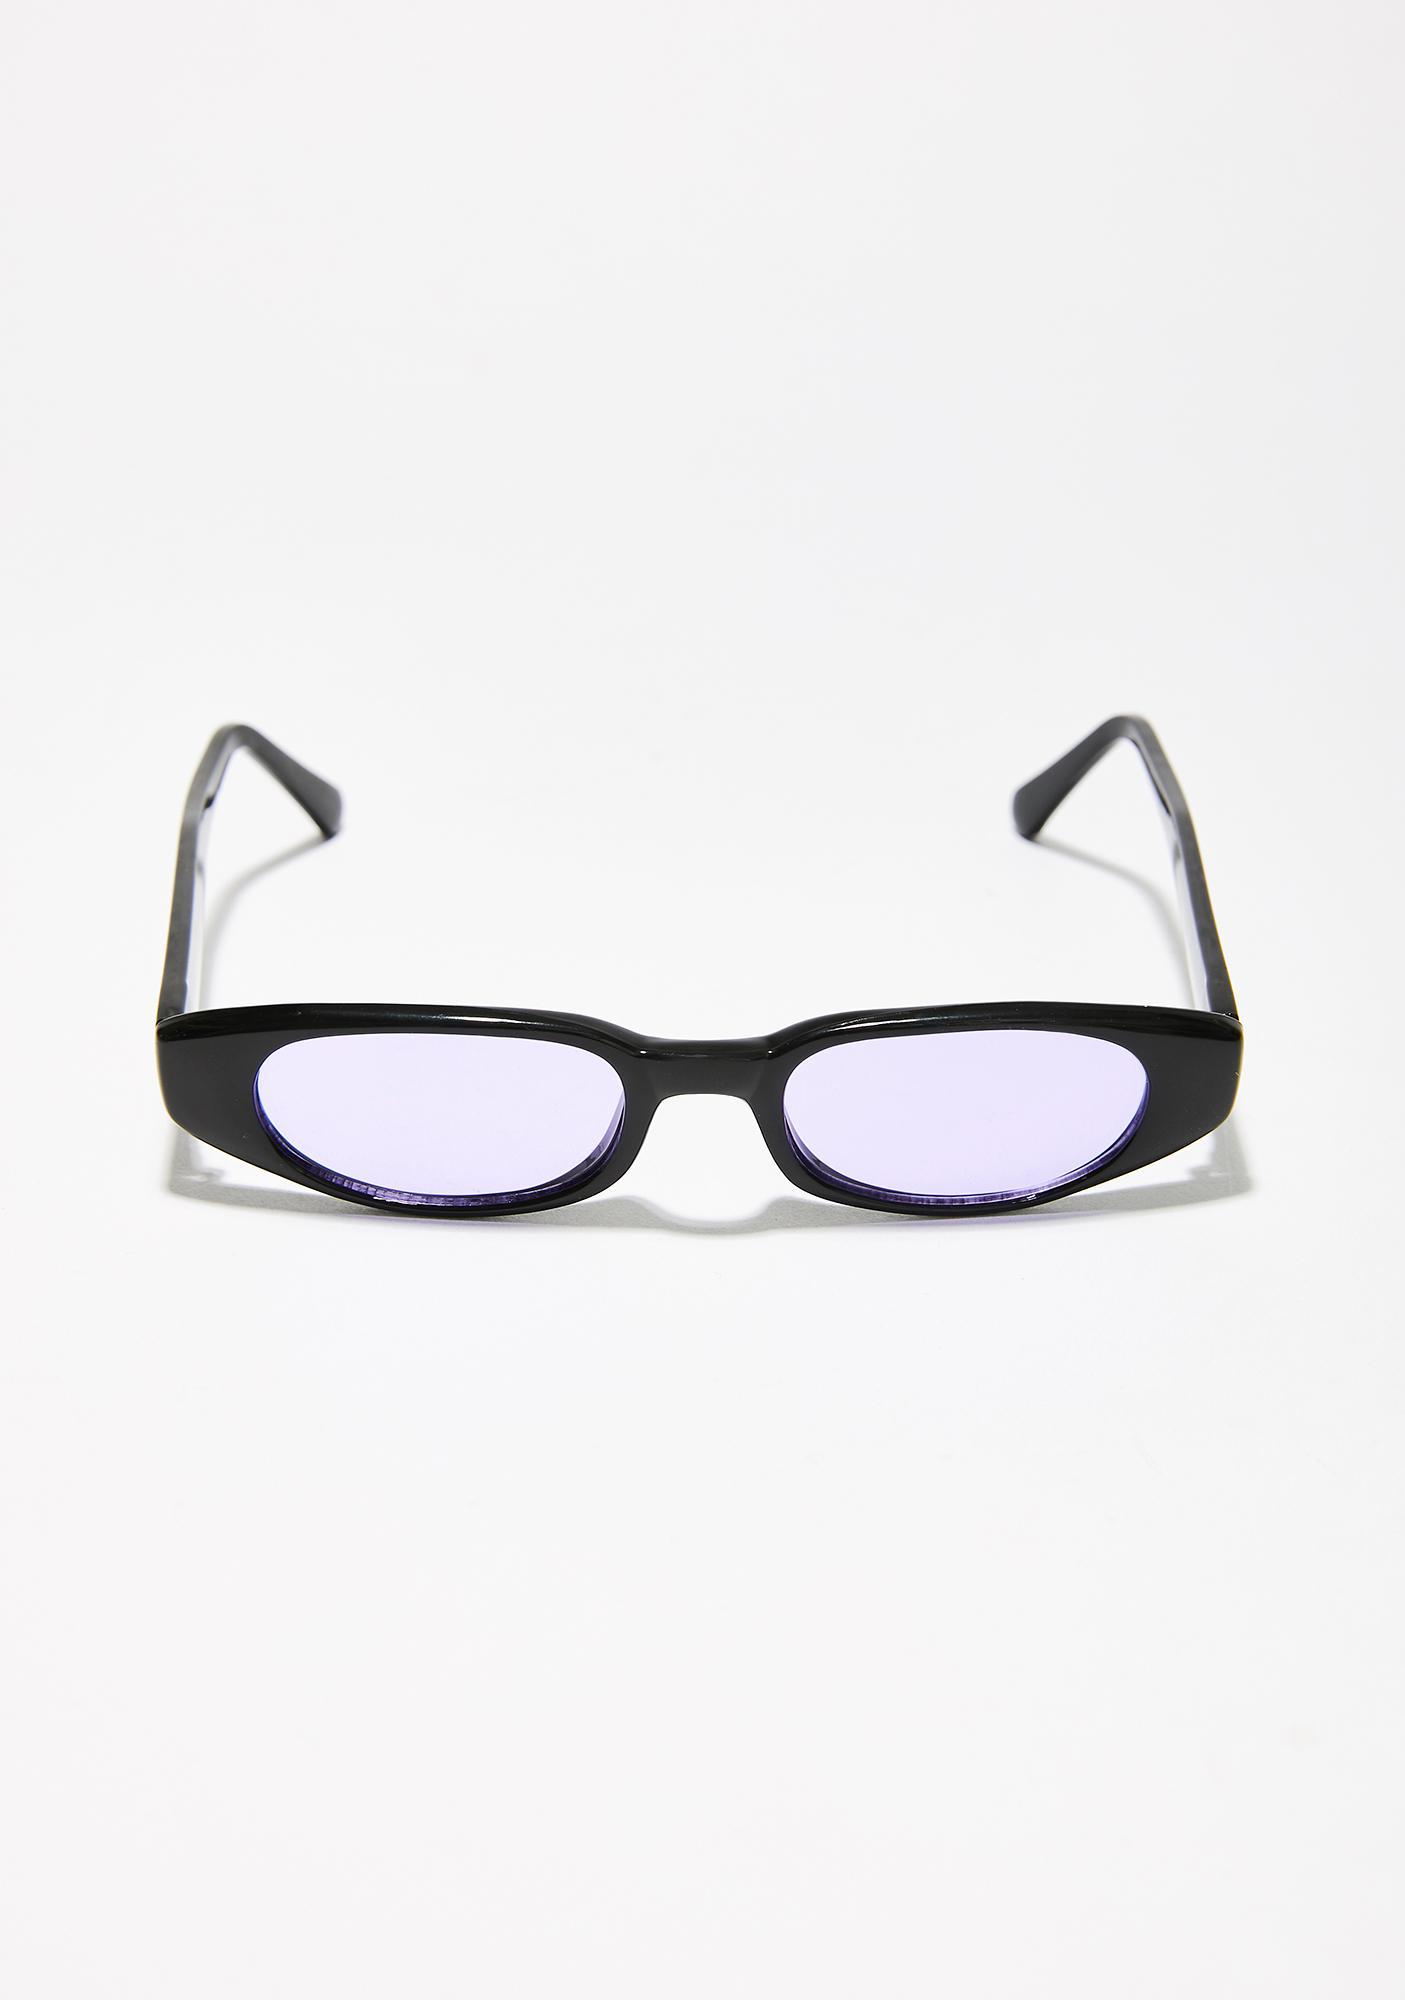 Fairy Lulu Retro Sunglasses